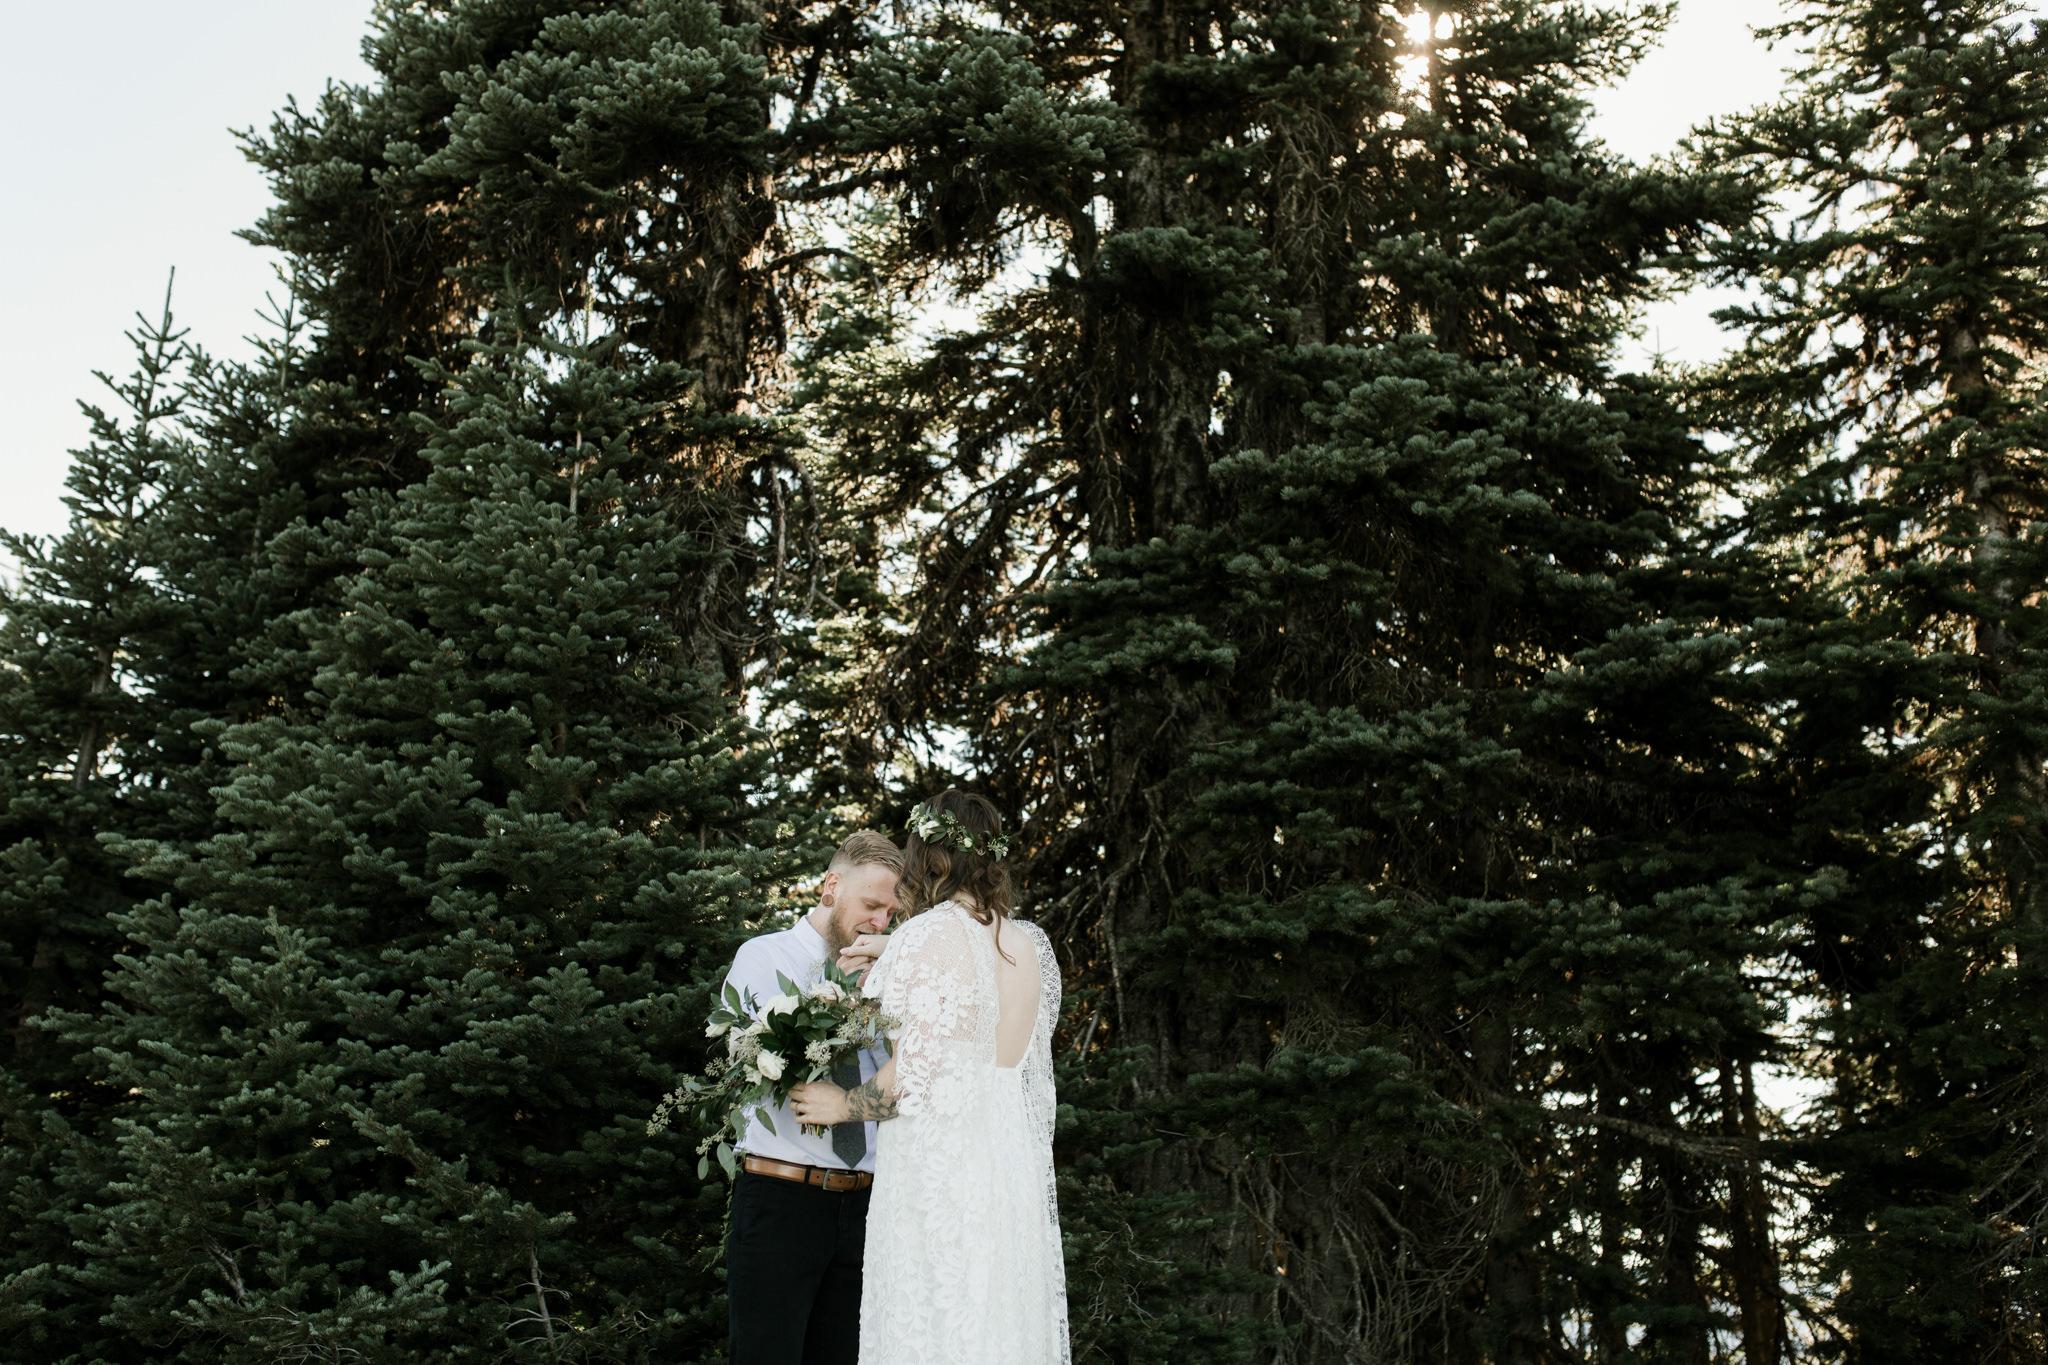 Jesse-Kasie-Hurricane-Ridge-Wedding-7.jpg